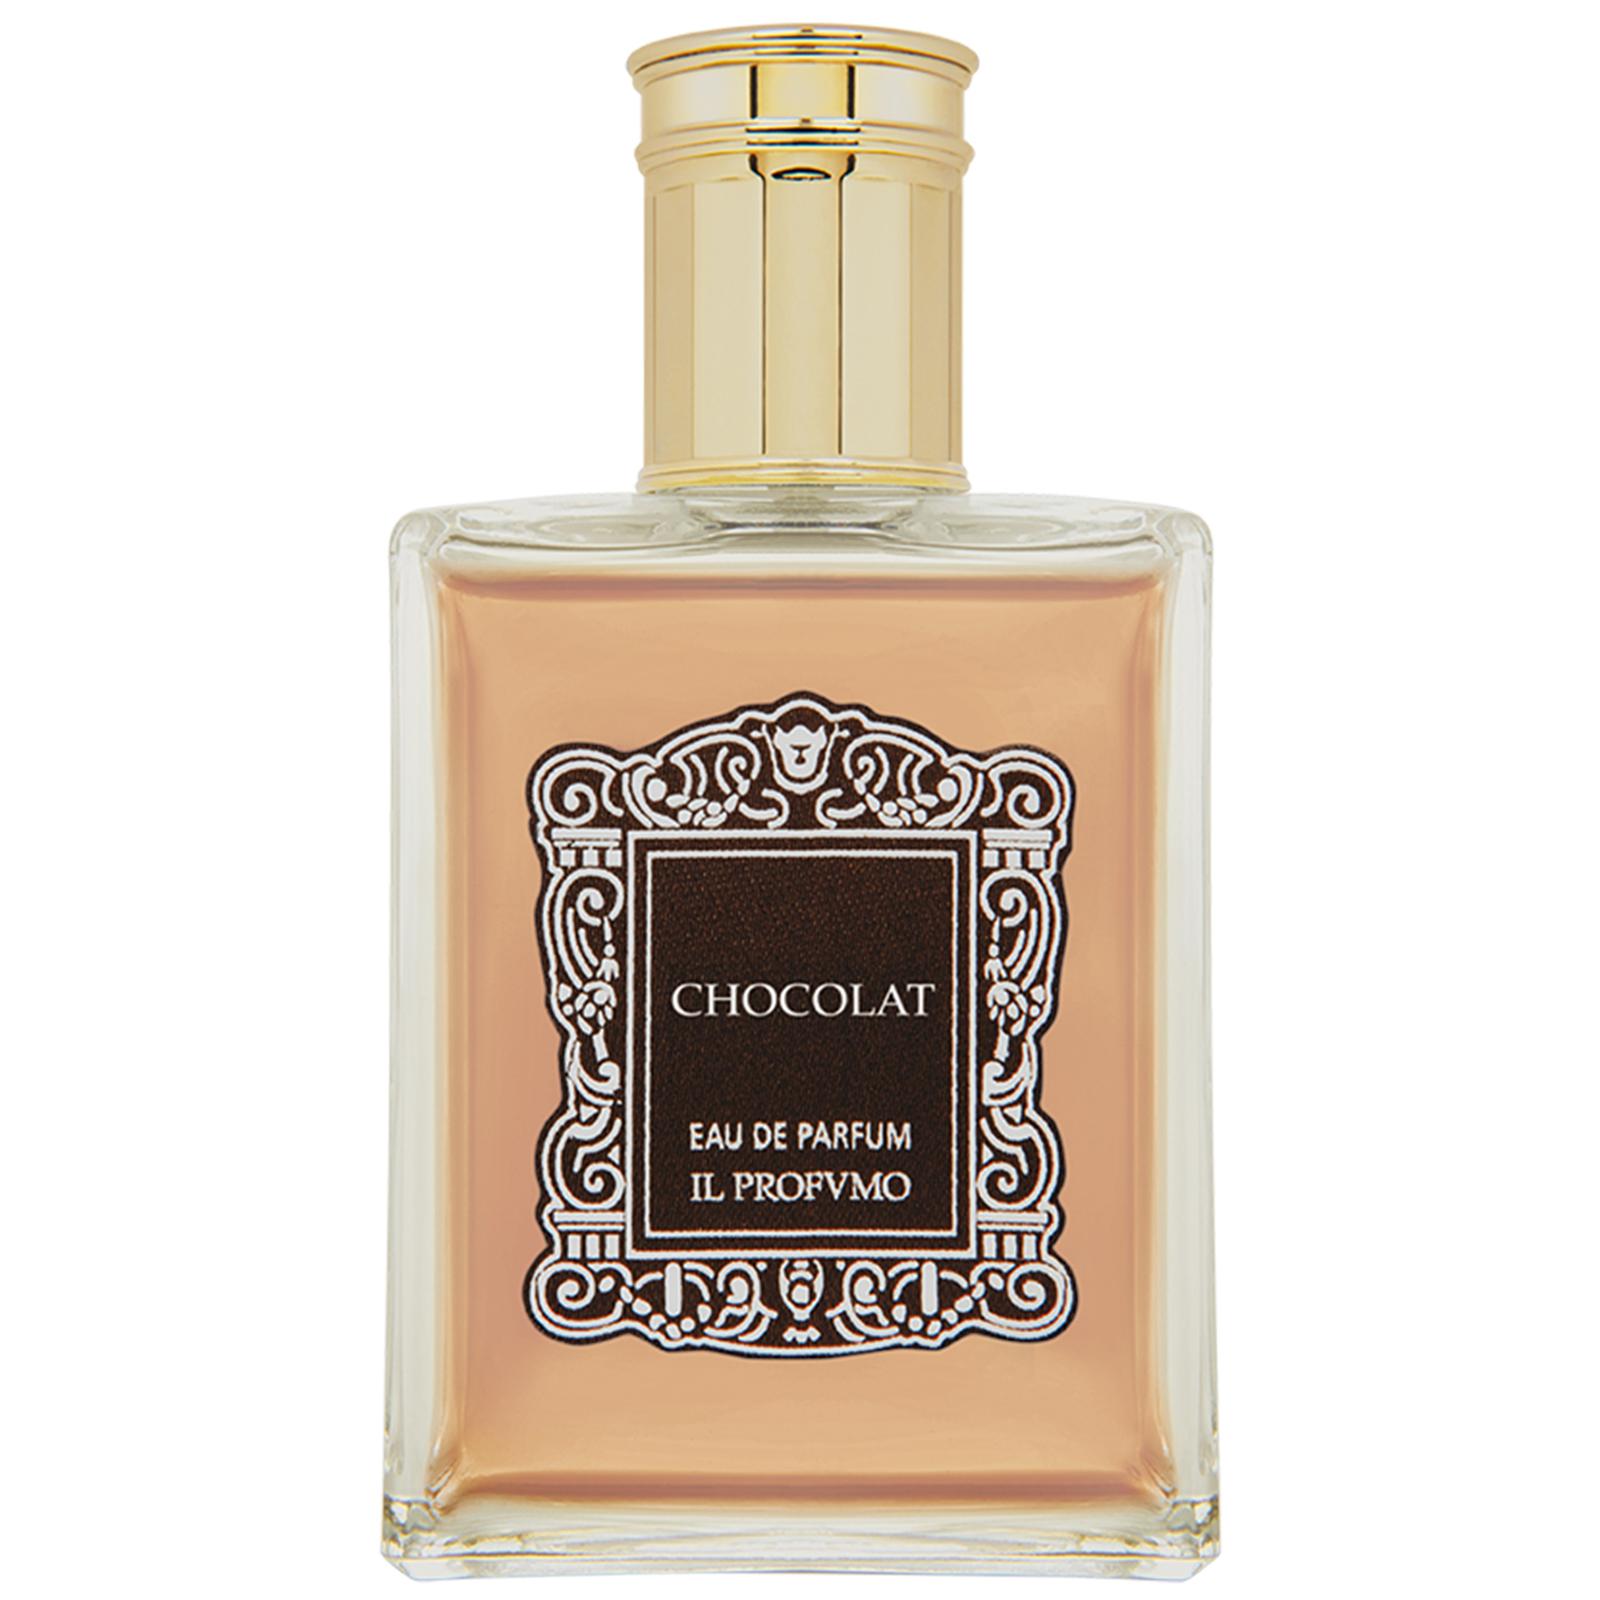 Chocolat profumo eau de parfum 100 ml